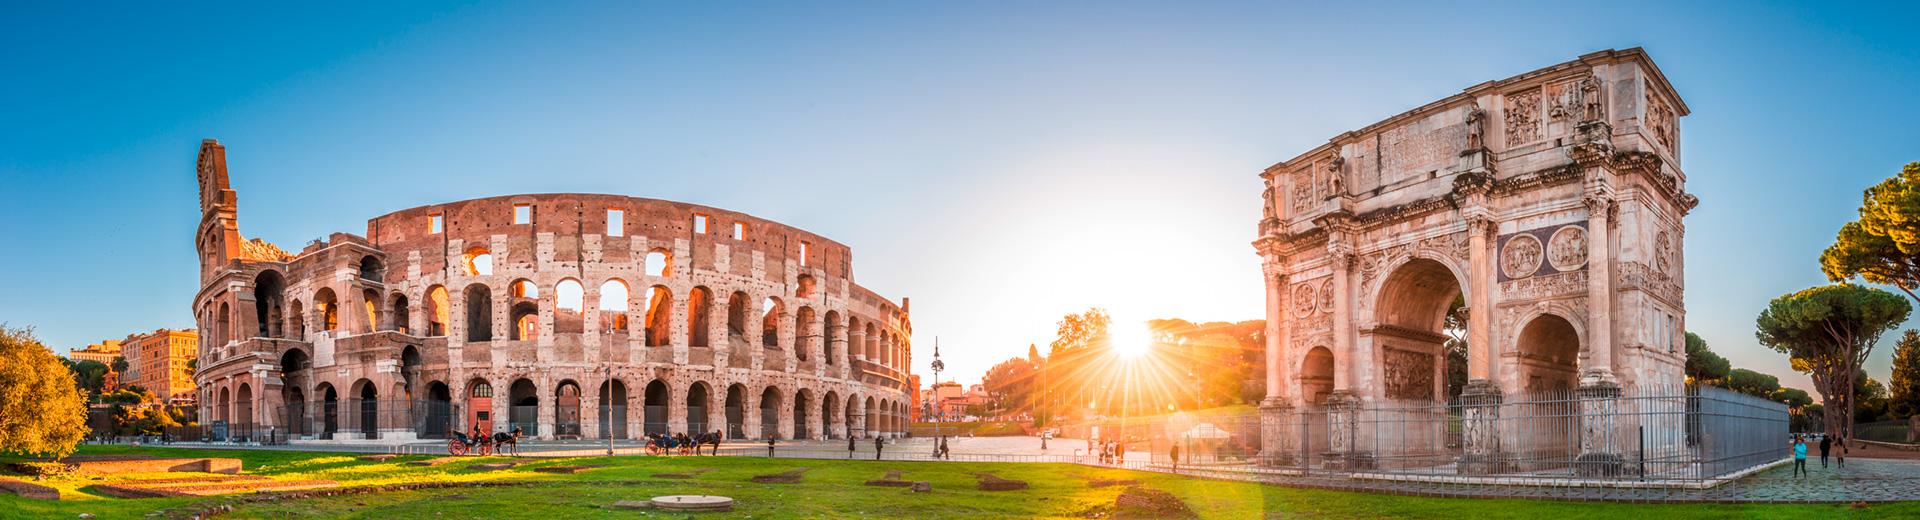 Rome Top